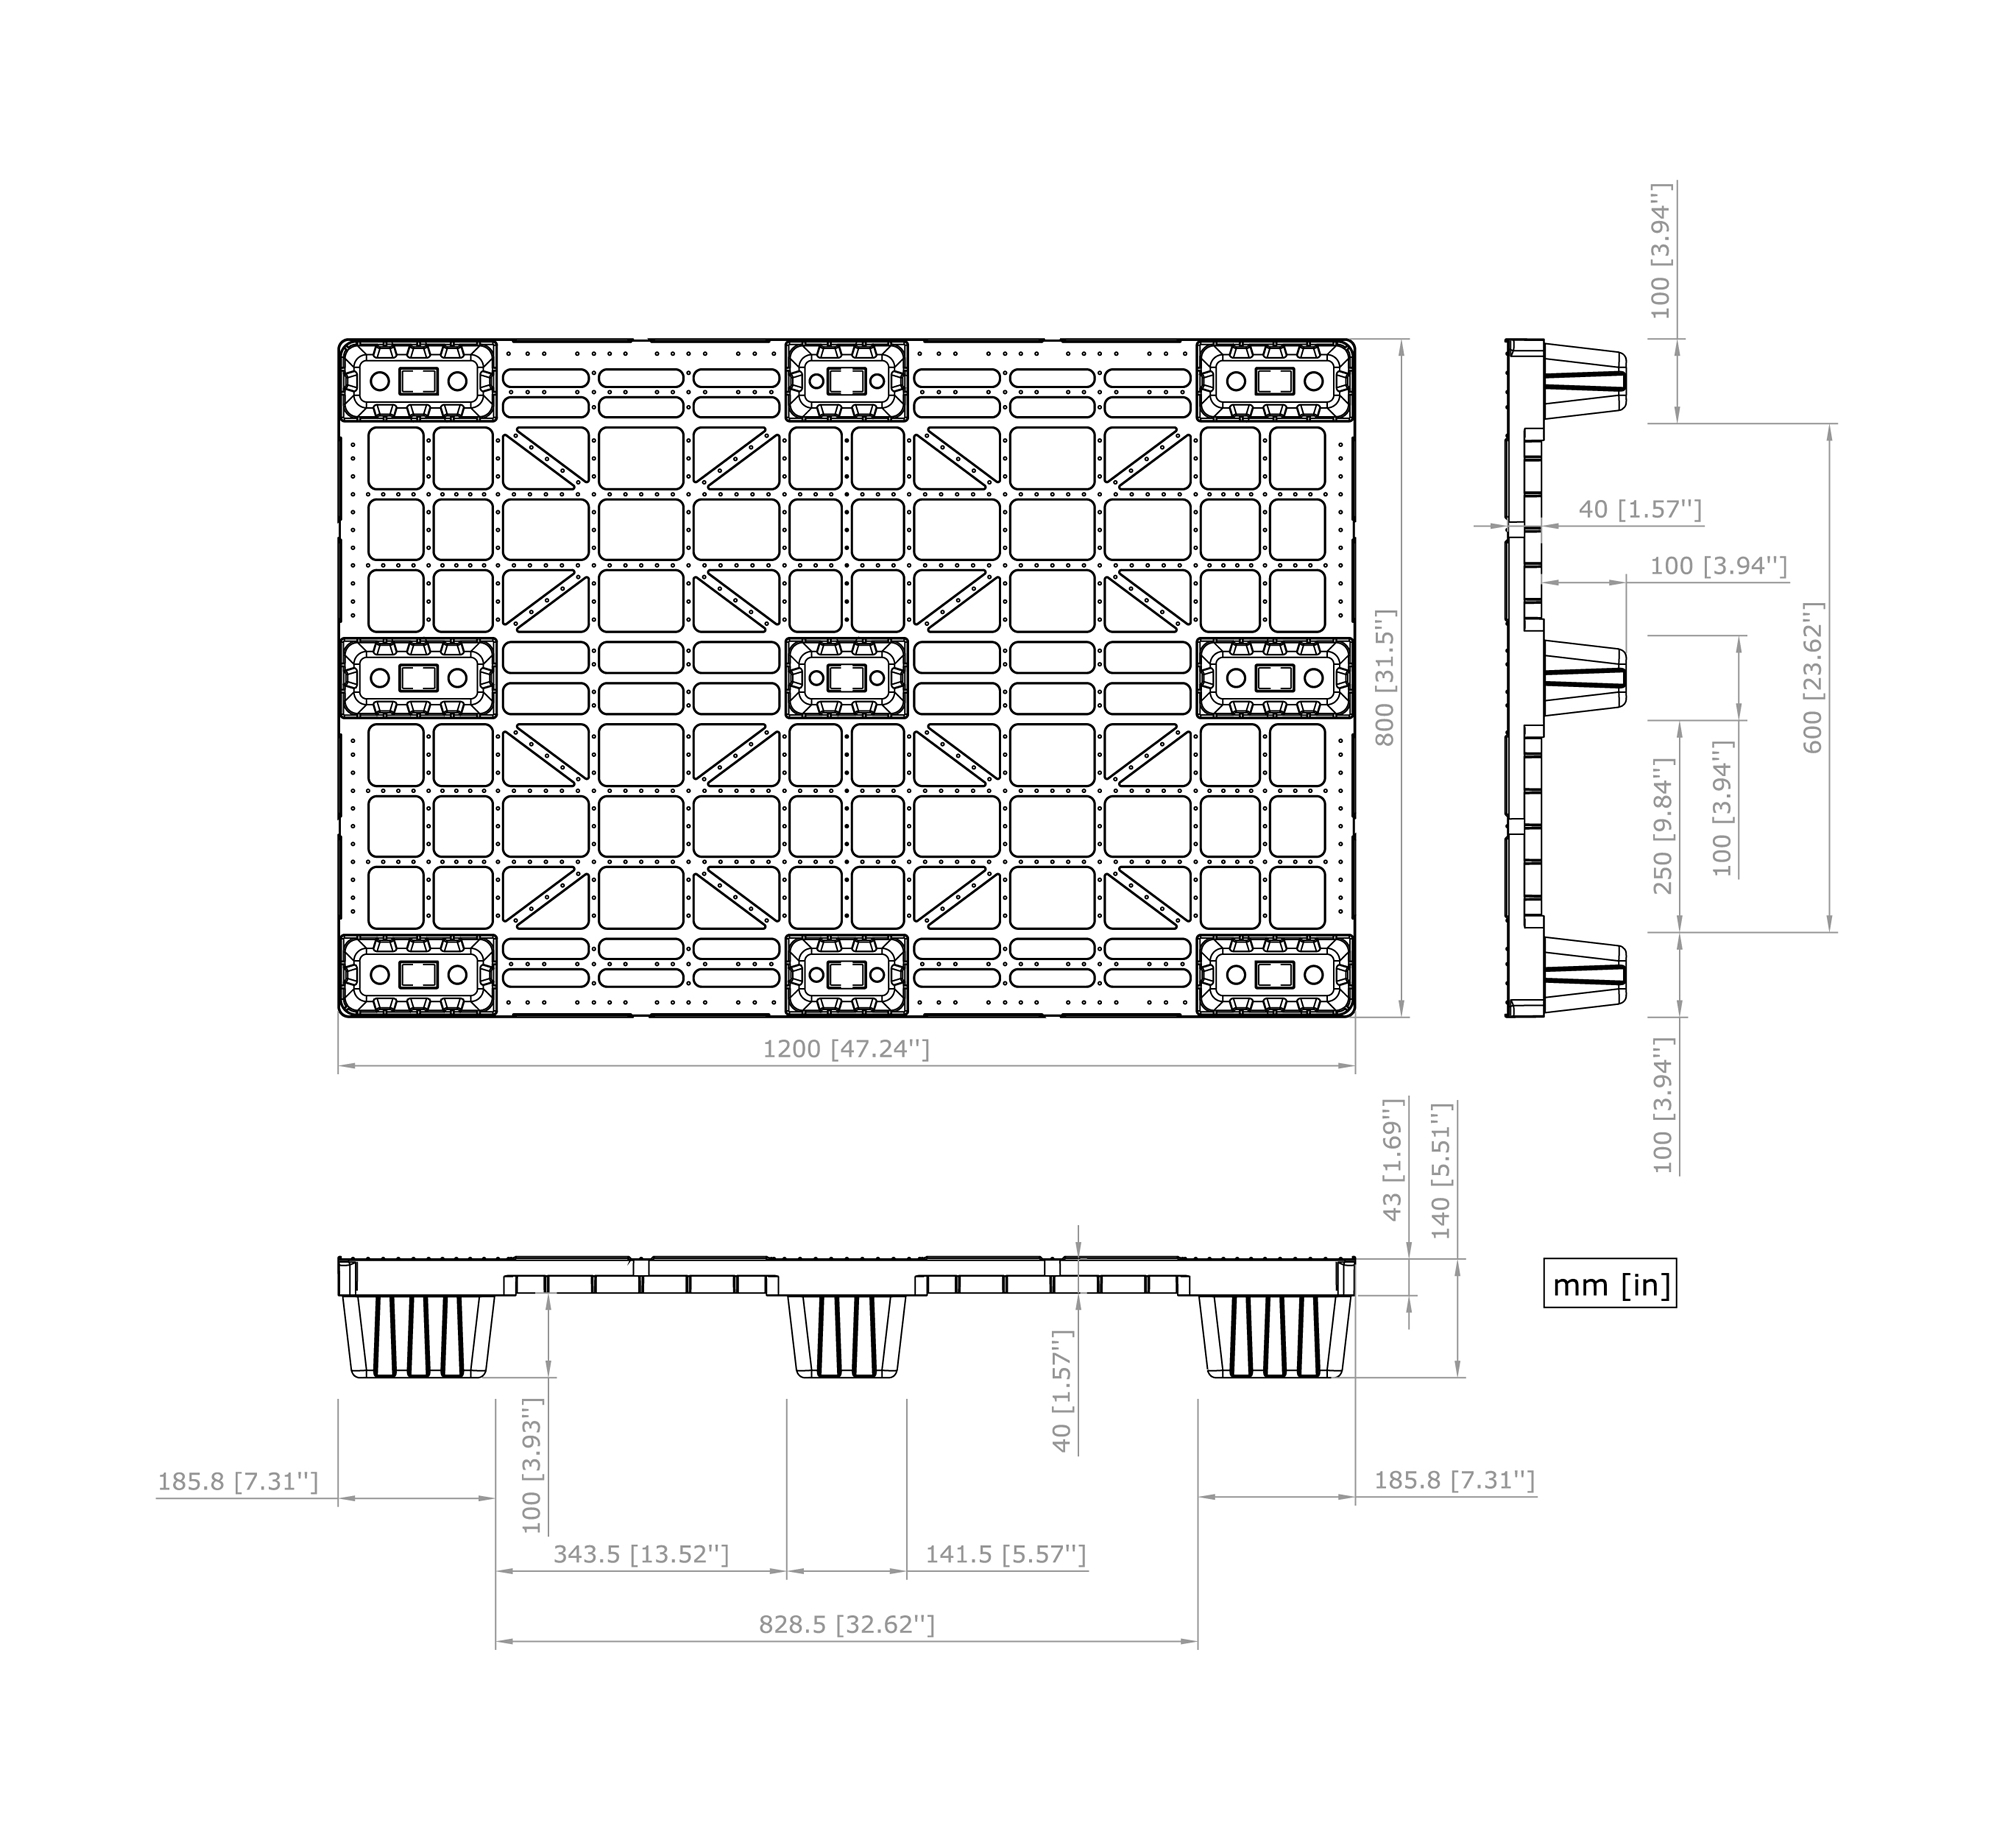 BASIC-1280-O9_esquema_1.jpg